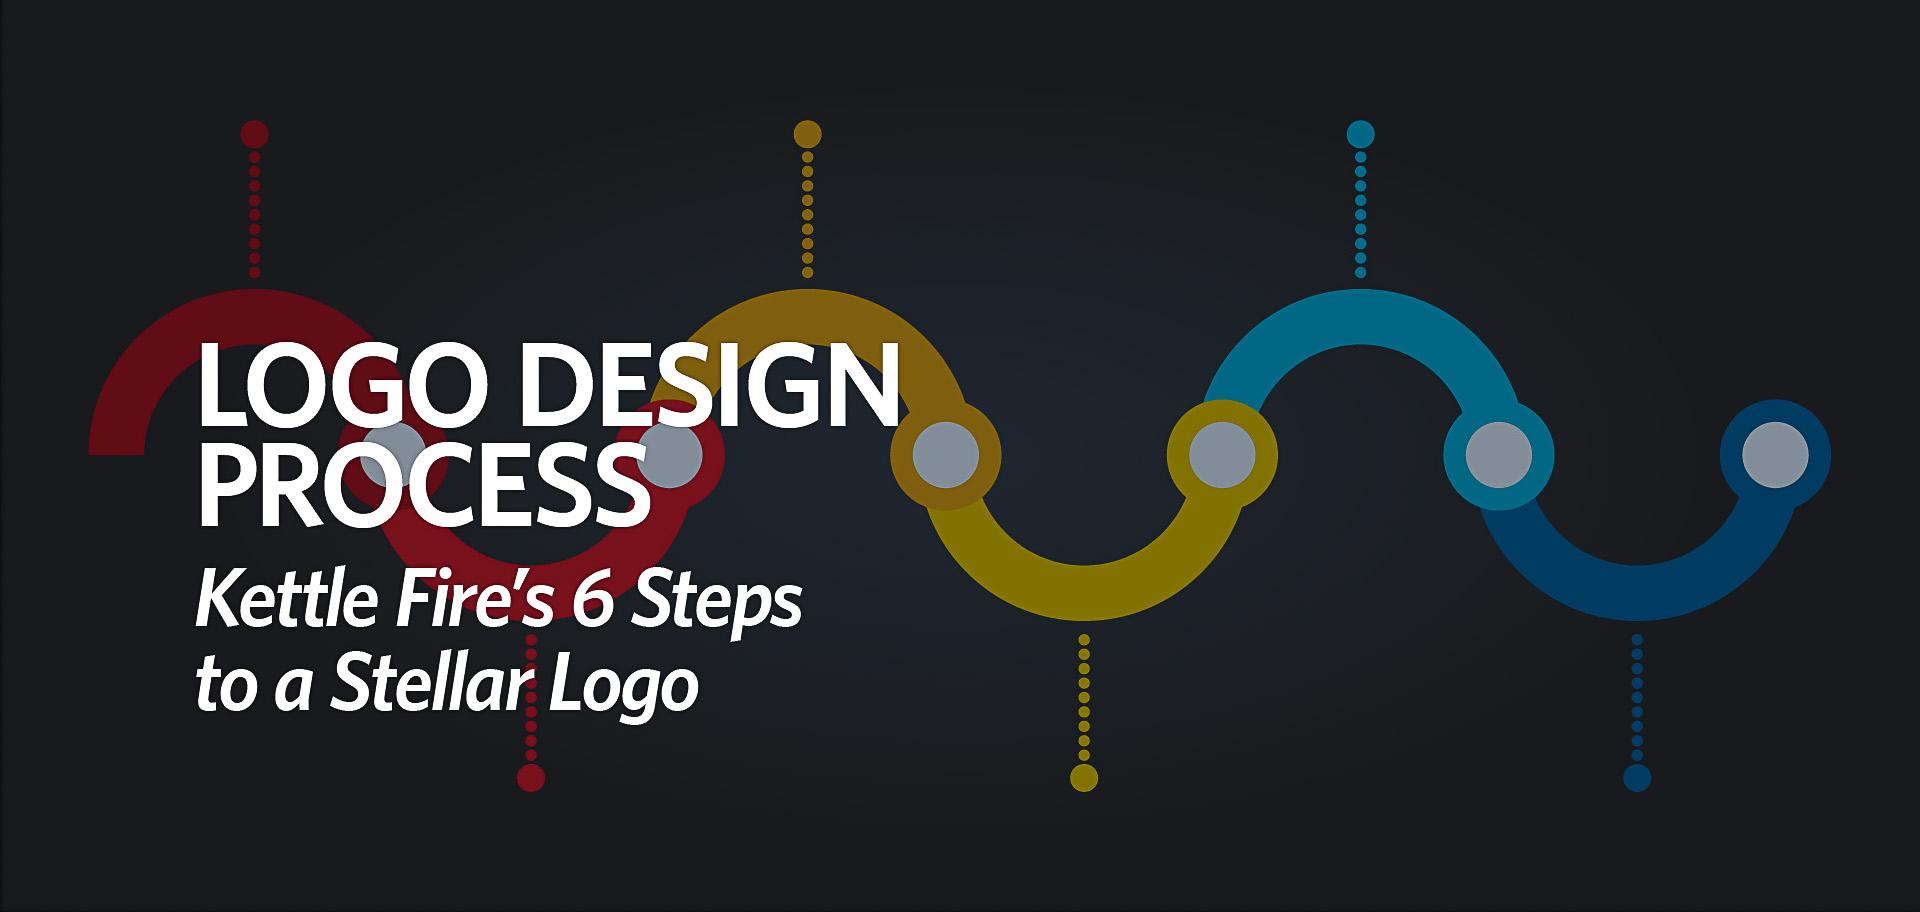 Logo design process, Kettle Fire Creative blog, steps to make a logo logo design Logo Design Process: Kettle Fire's 6 Steps to a Stellar Logo fi